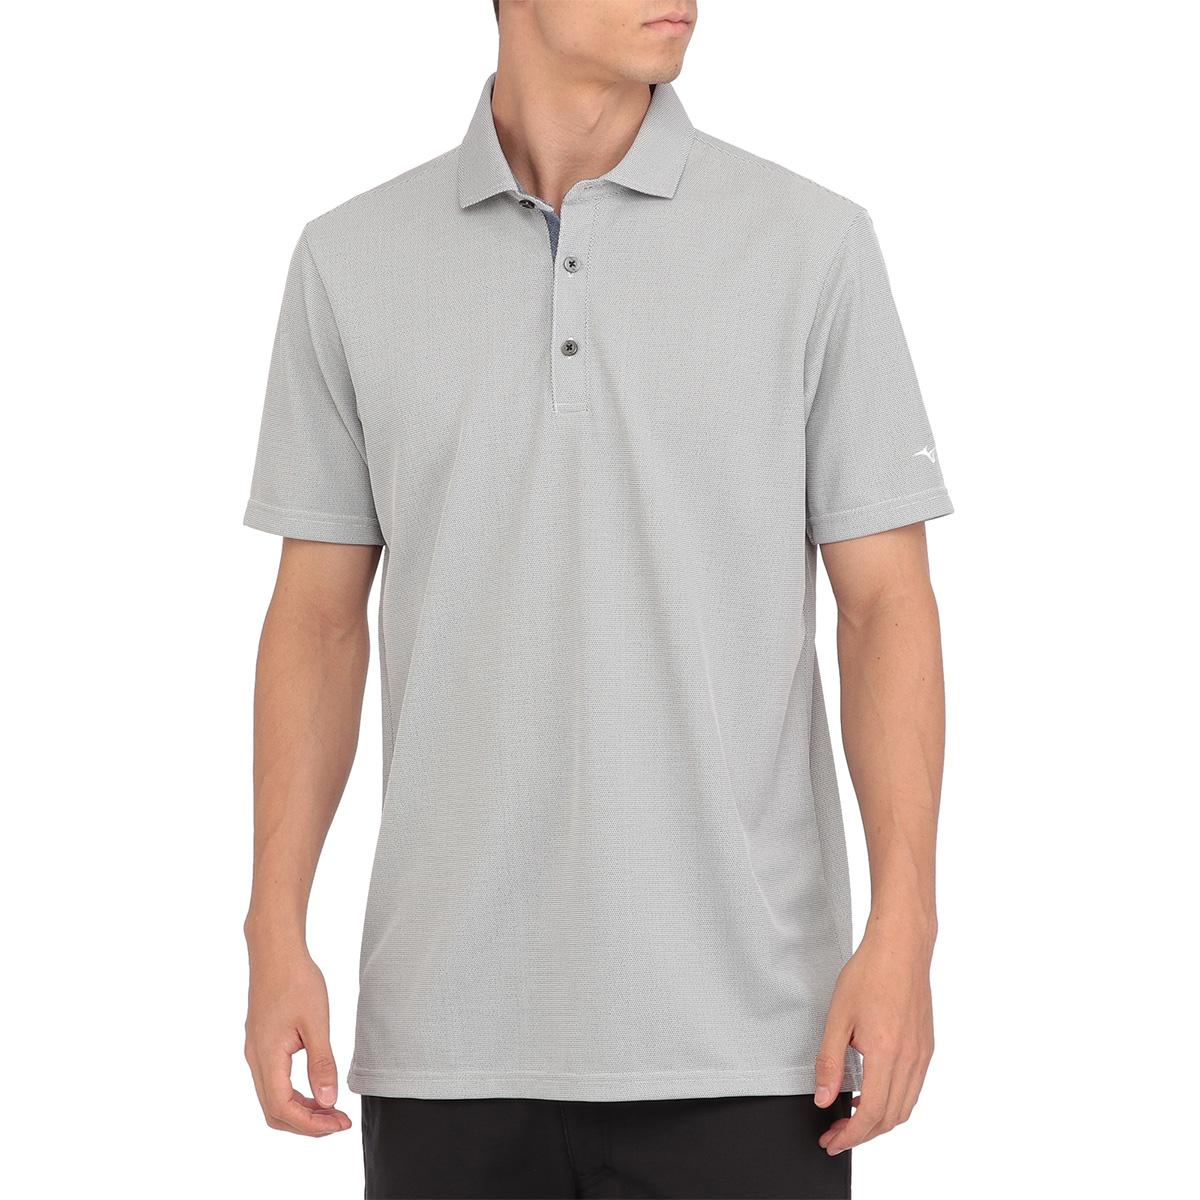 GOLF アイスタッチシャンブレー半袖ポロシャツ